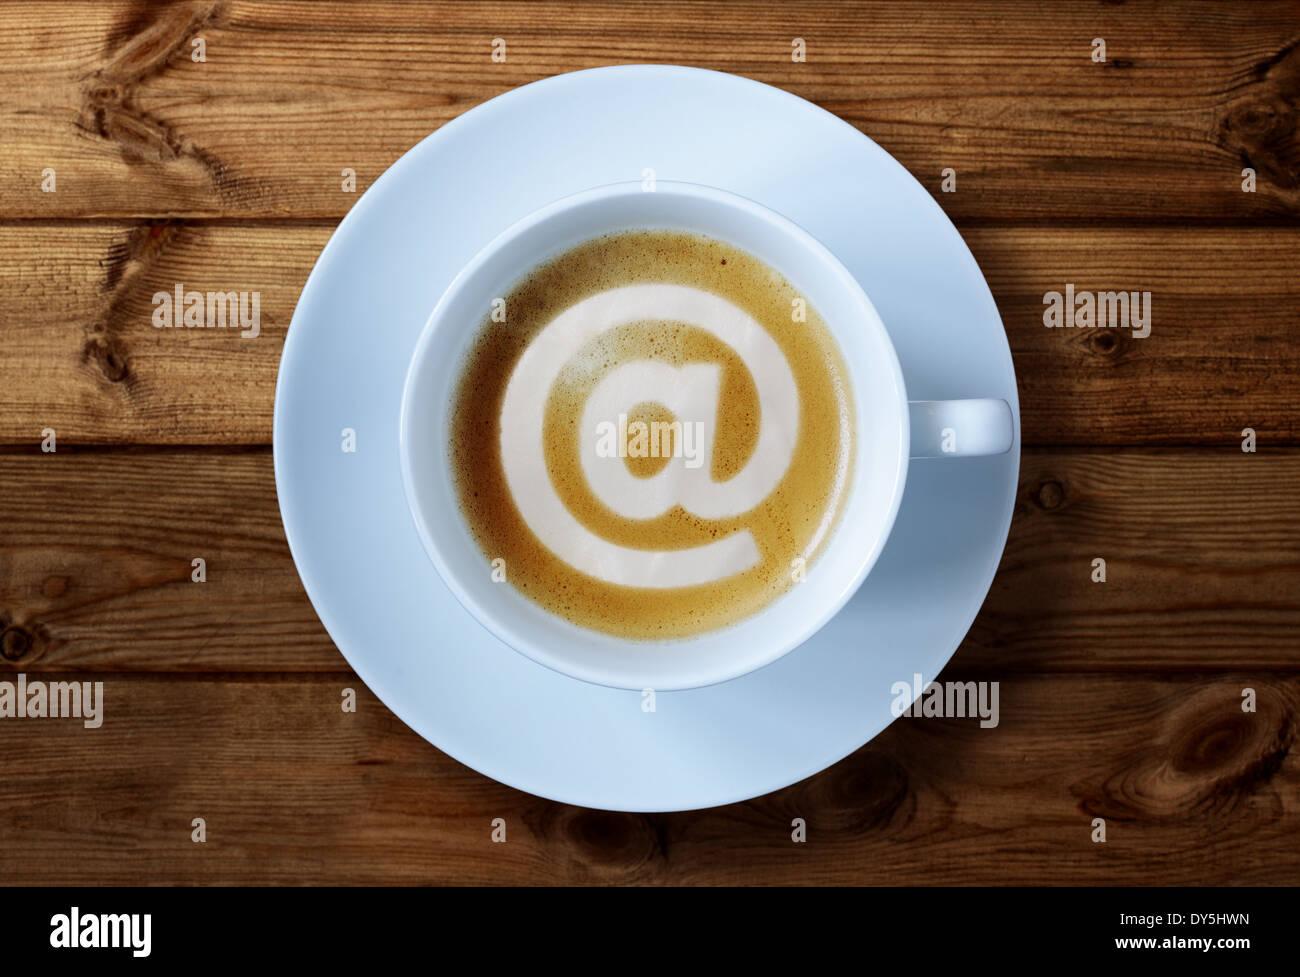 Internet cafe - Stock Image